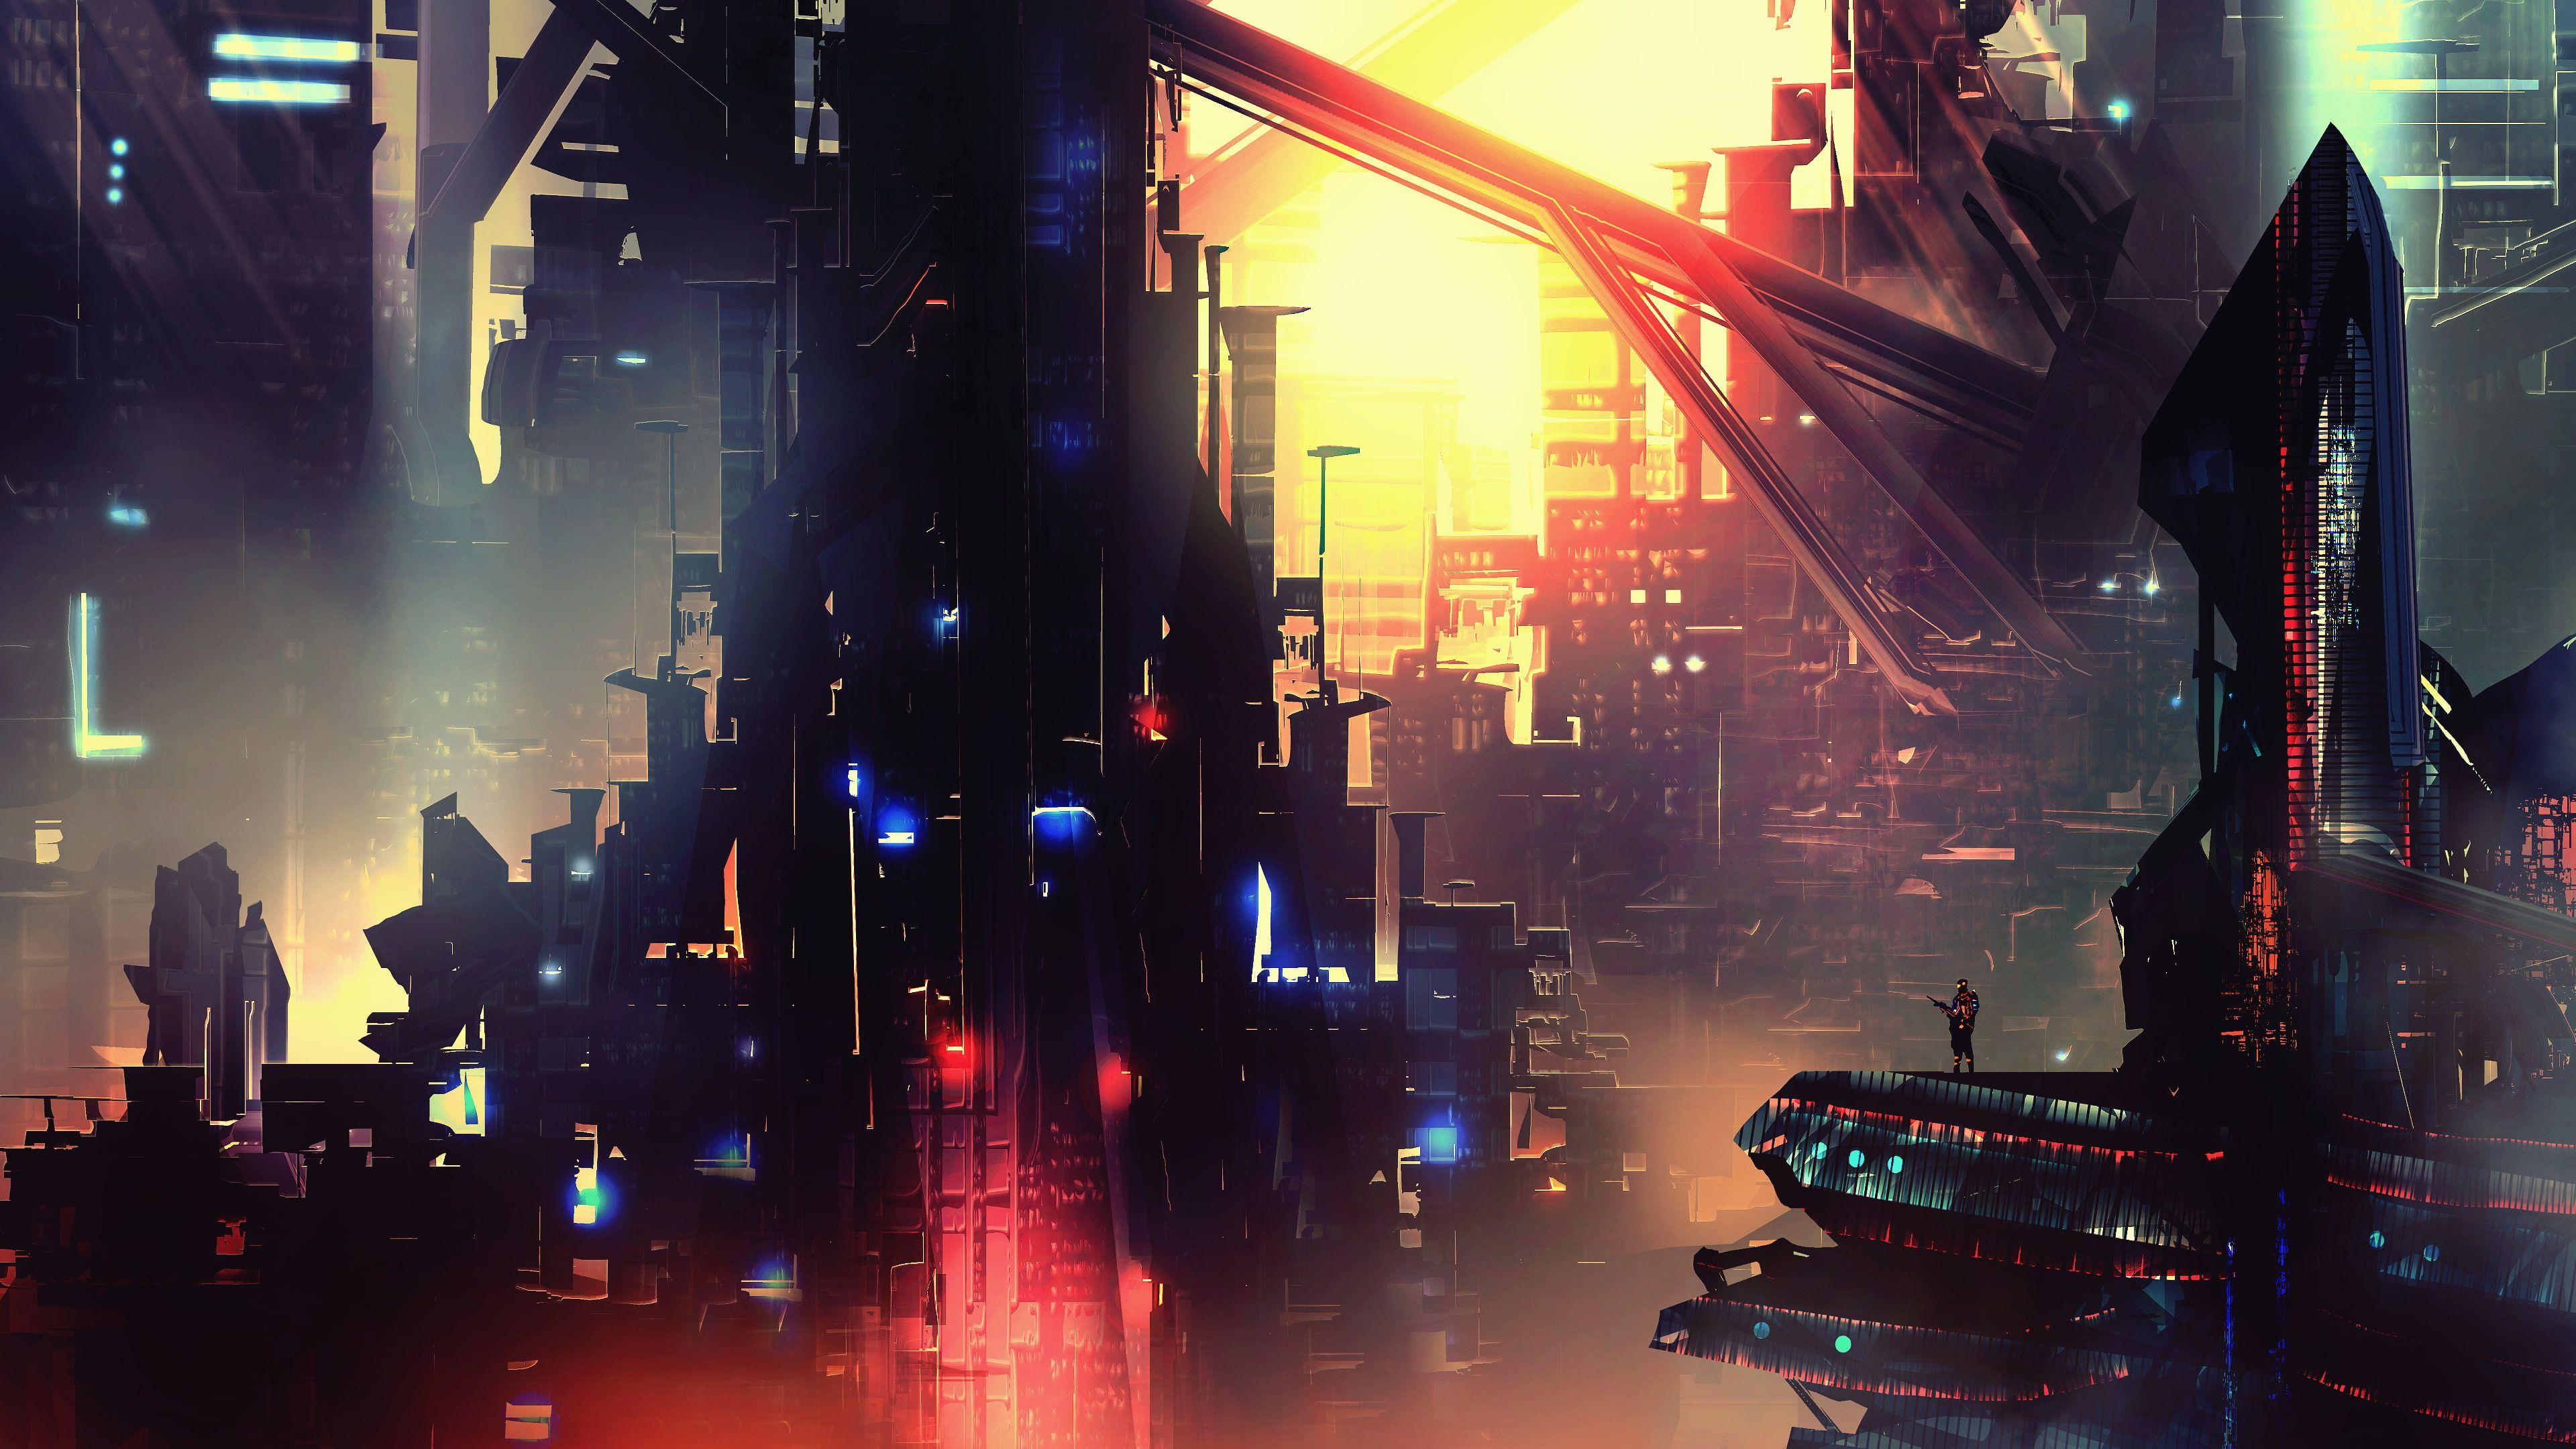 Night Artwork Futuristic City Cyberpunk Cyber Science Fiction Digital Art Concept Art Fantasy Art Cgi Aesthetic Wallpapers Futuristic City Cyberpunk City